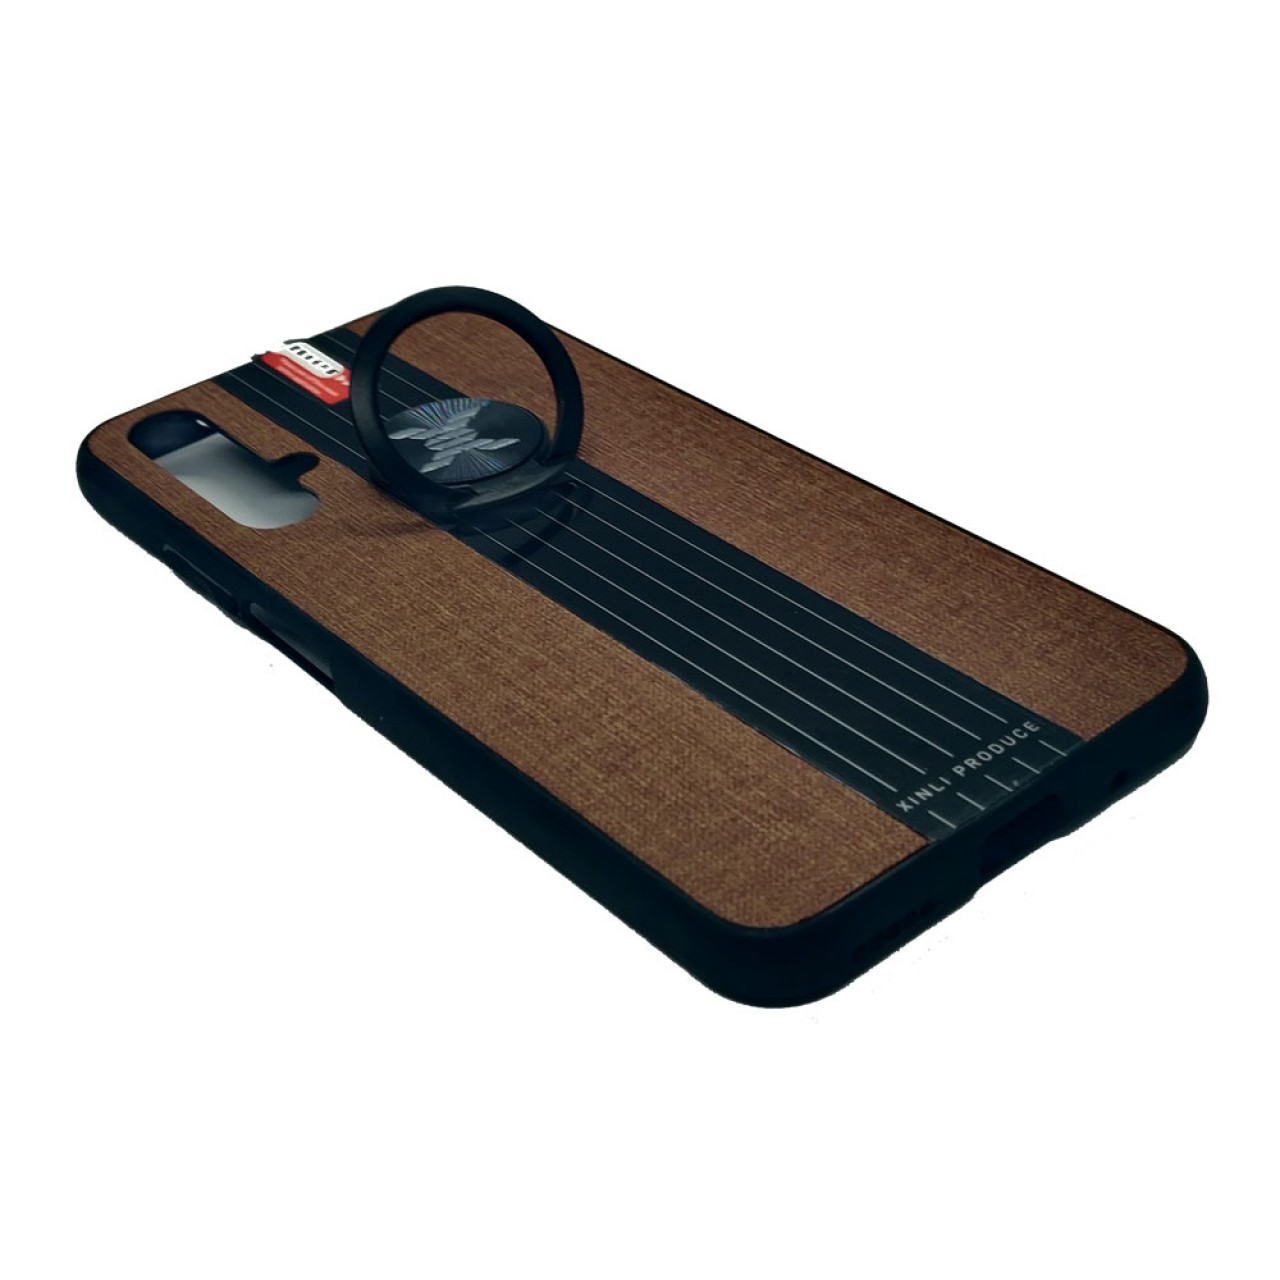 Back Case Cloth Pattern with ring Brown for  Huawei Nova 5T - Θήκη προστασίας με δαχτυλίδι στην πλάτη Καφέ - OEM